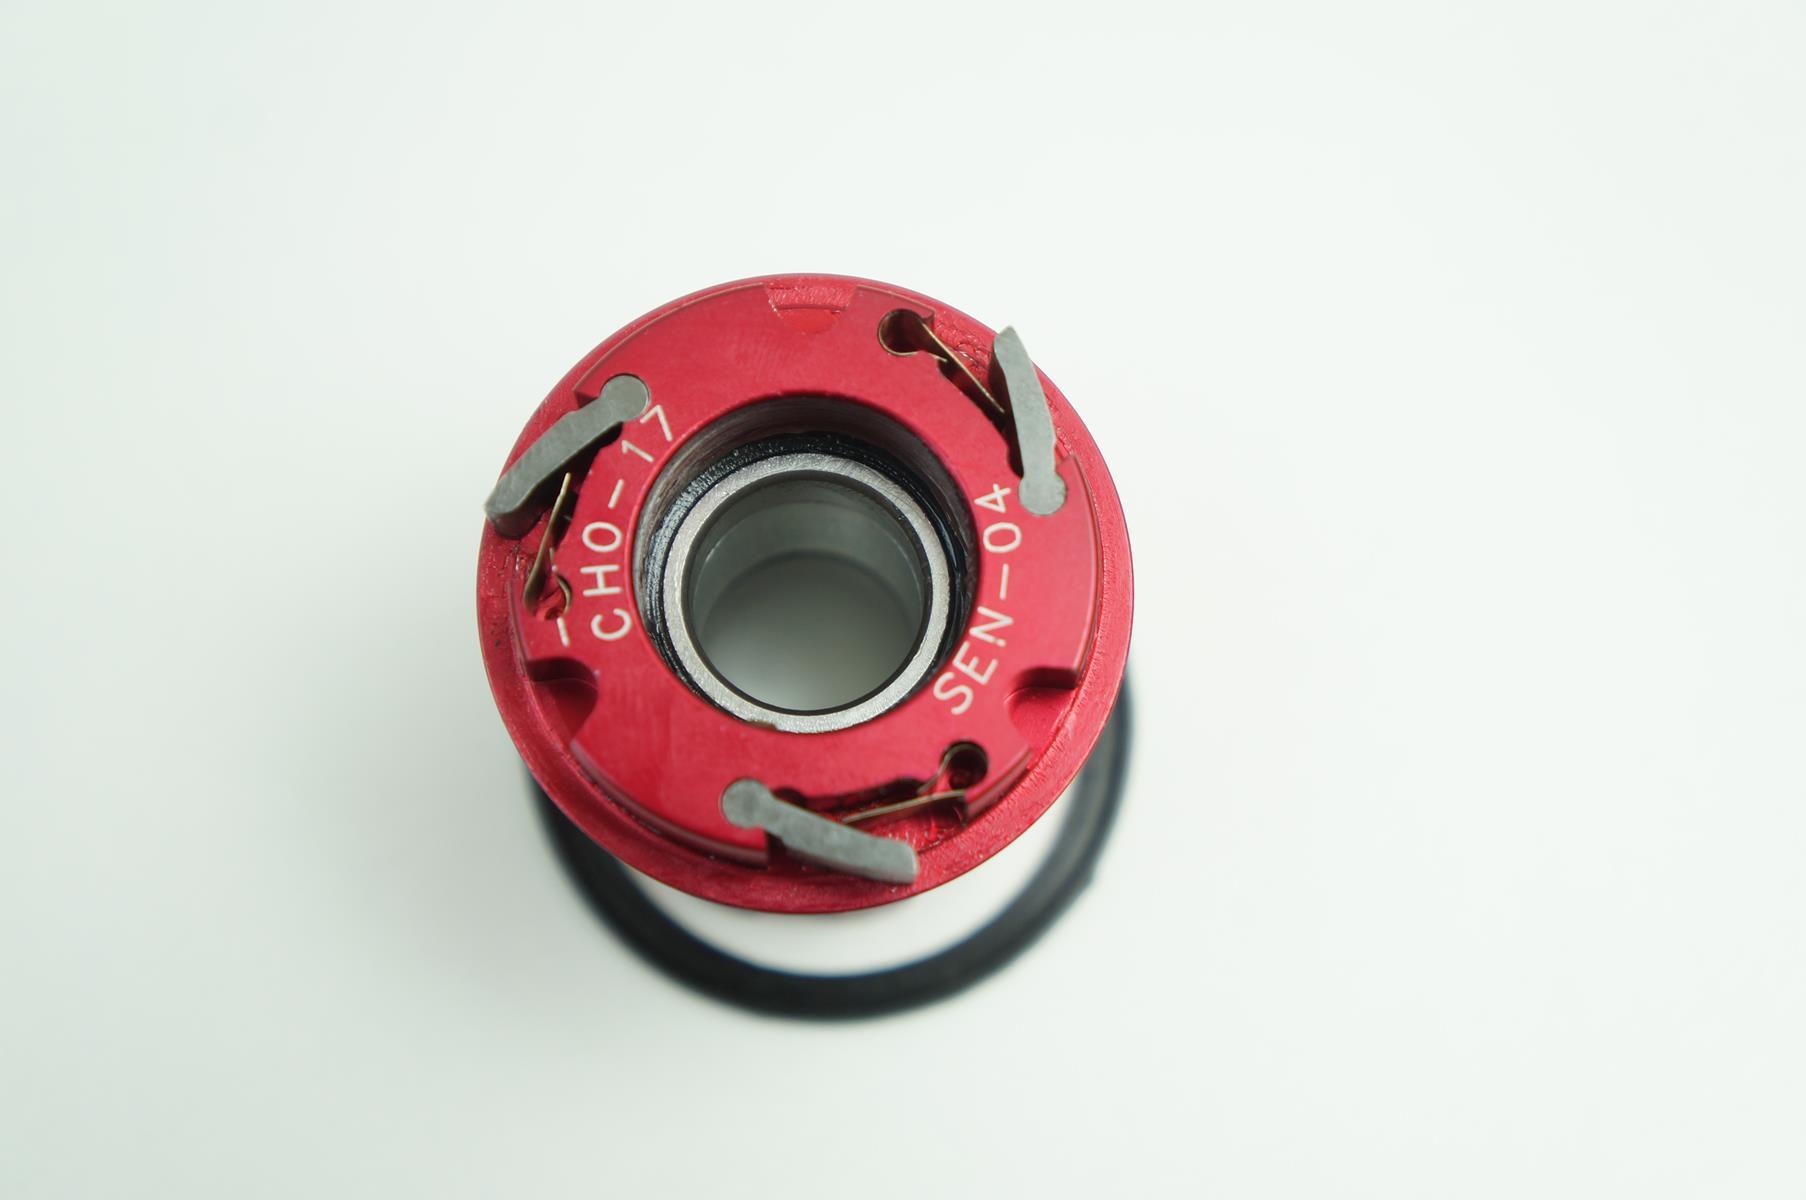 Freehub Cubo Vicinitech RA1490 para Cassetes Shimano Sram até 11 velocidades Road